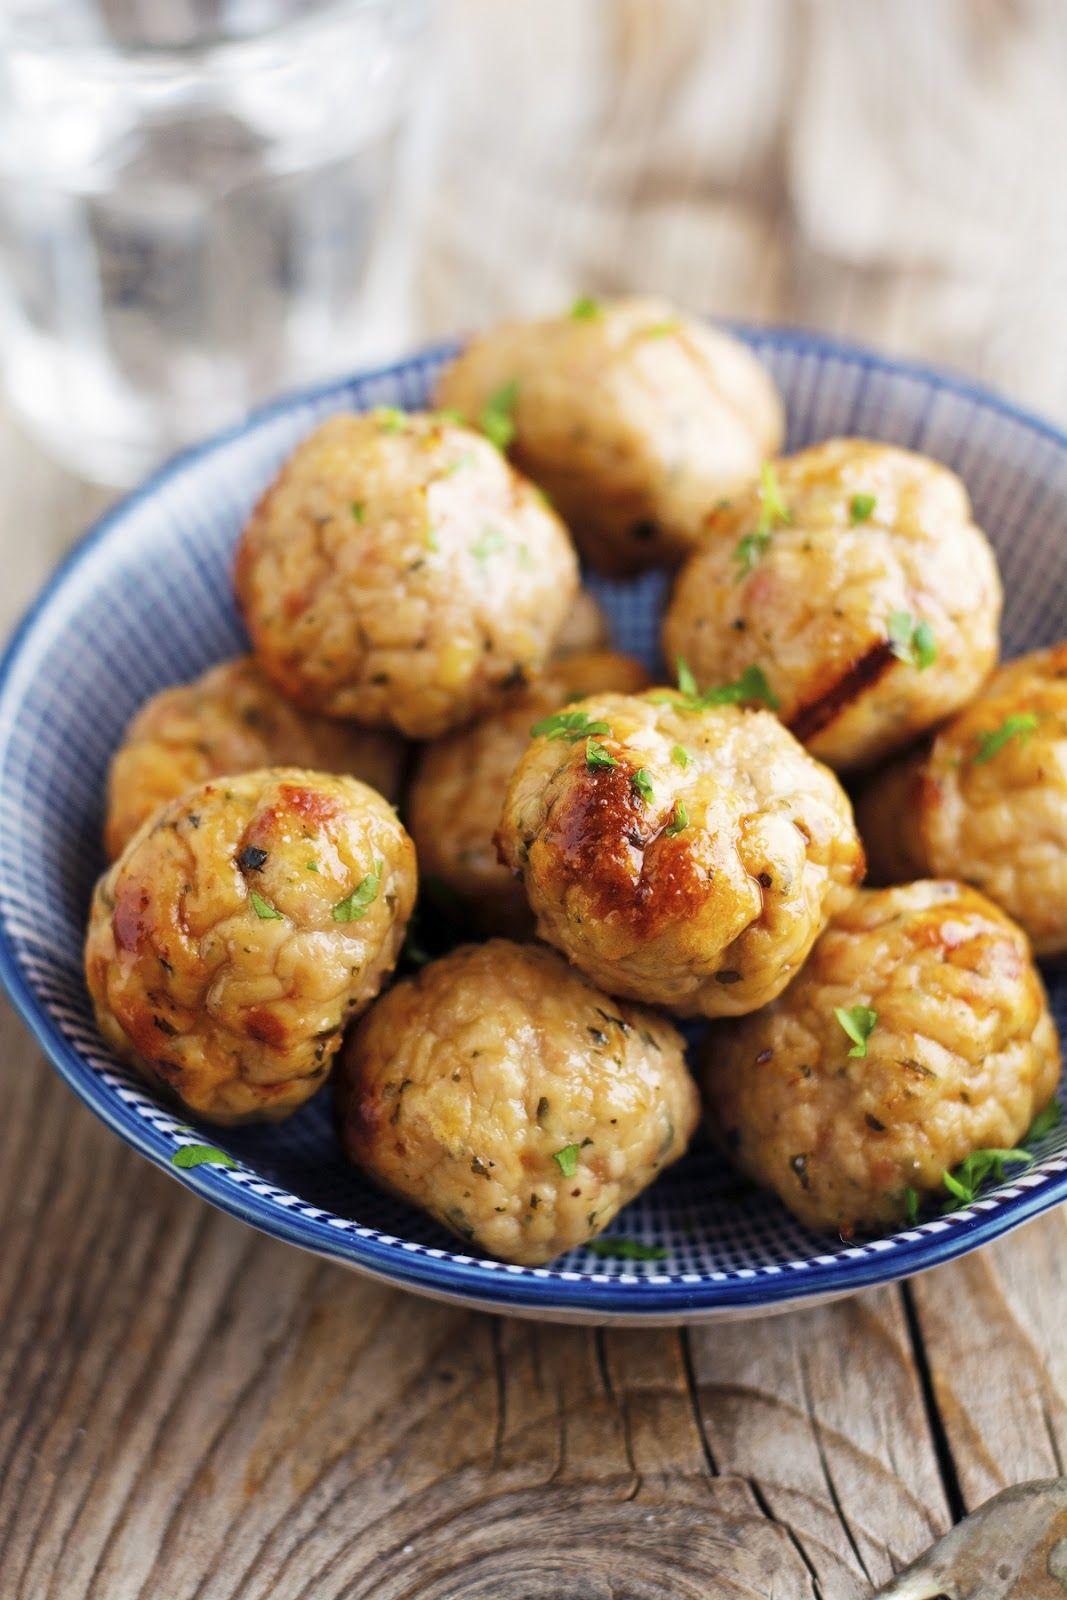 Mom's Baked Turkey Meatballs